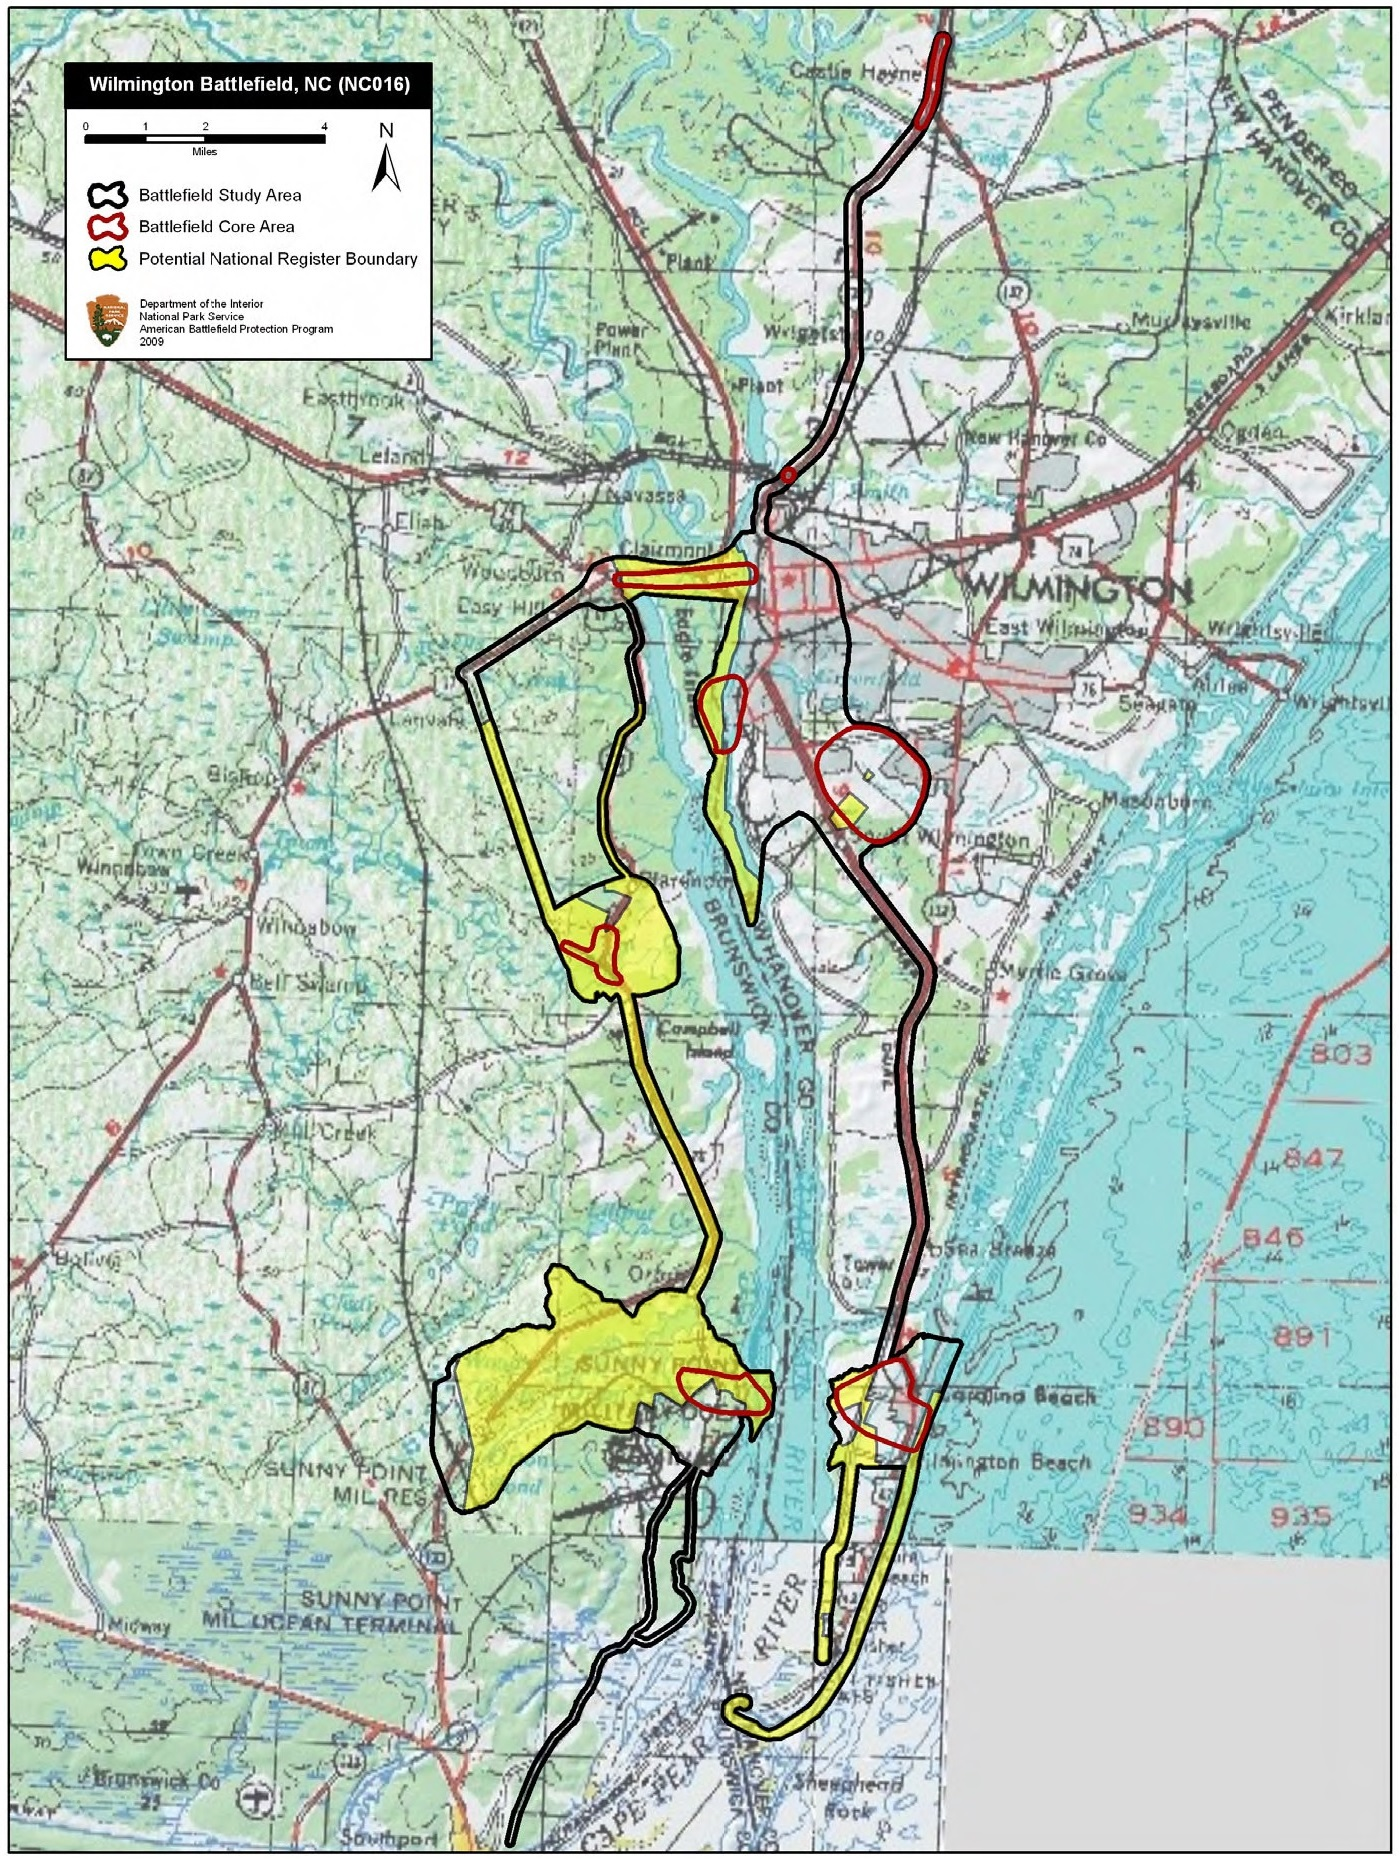 Battle of Wilmington Wikipedia